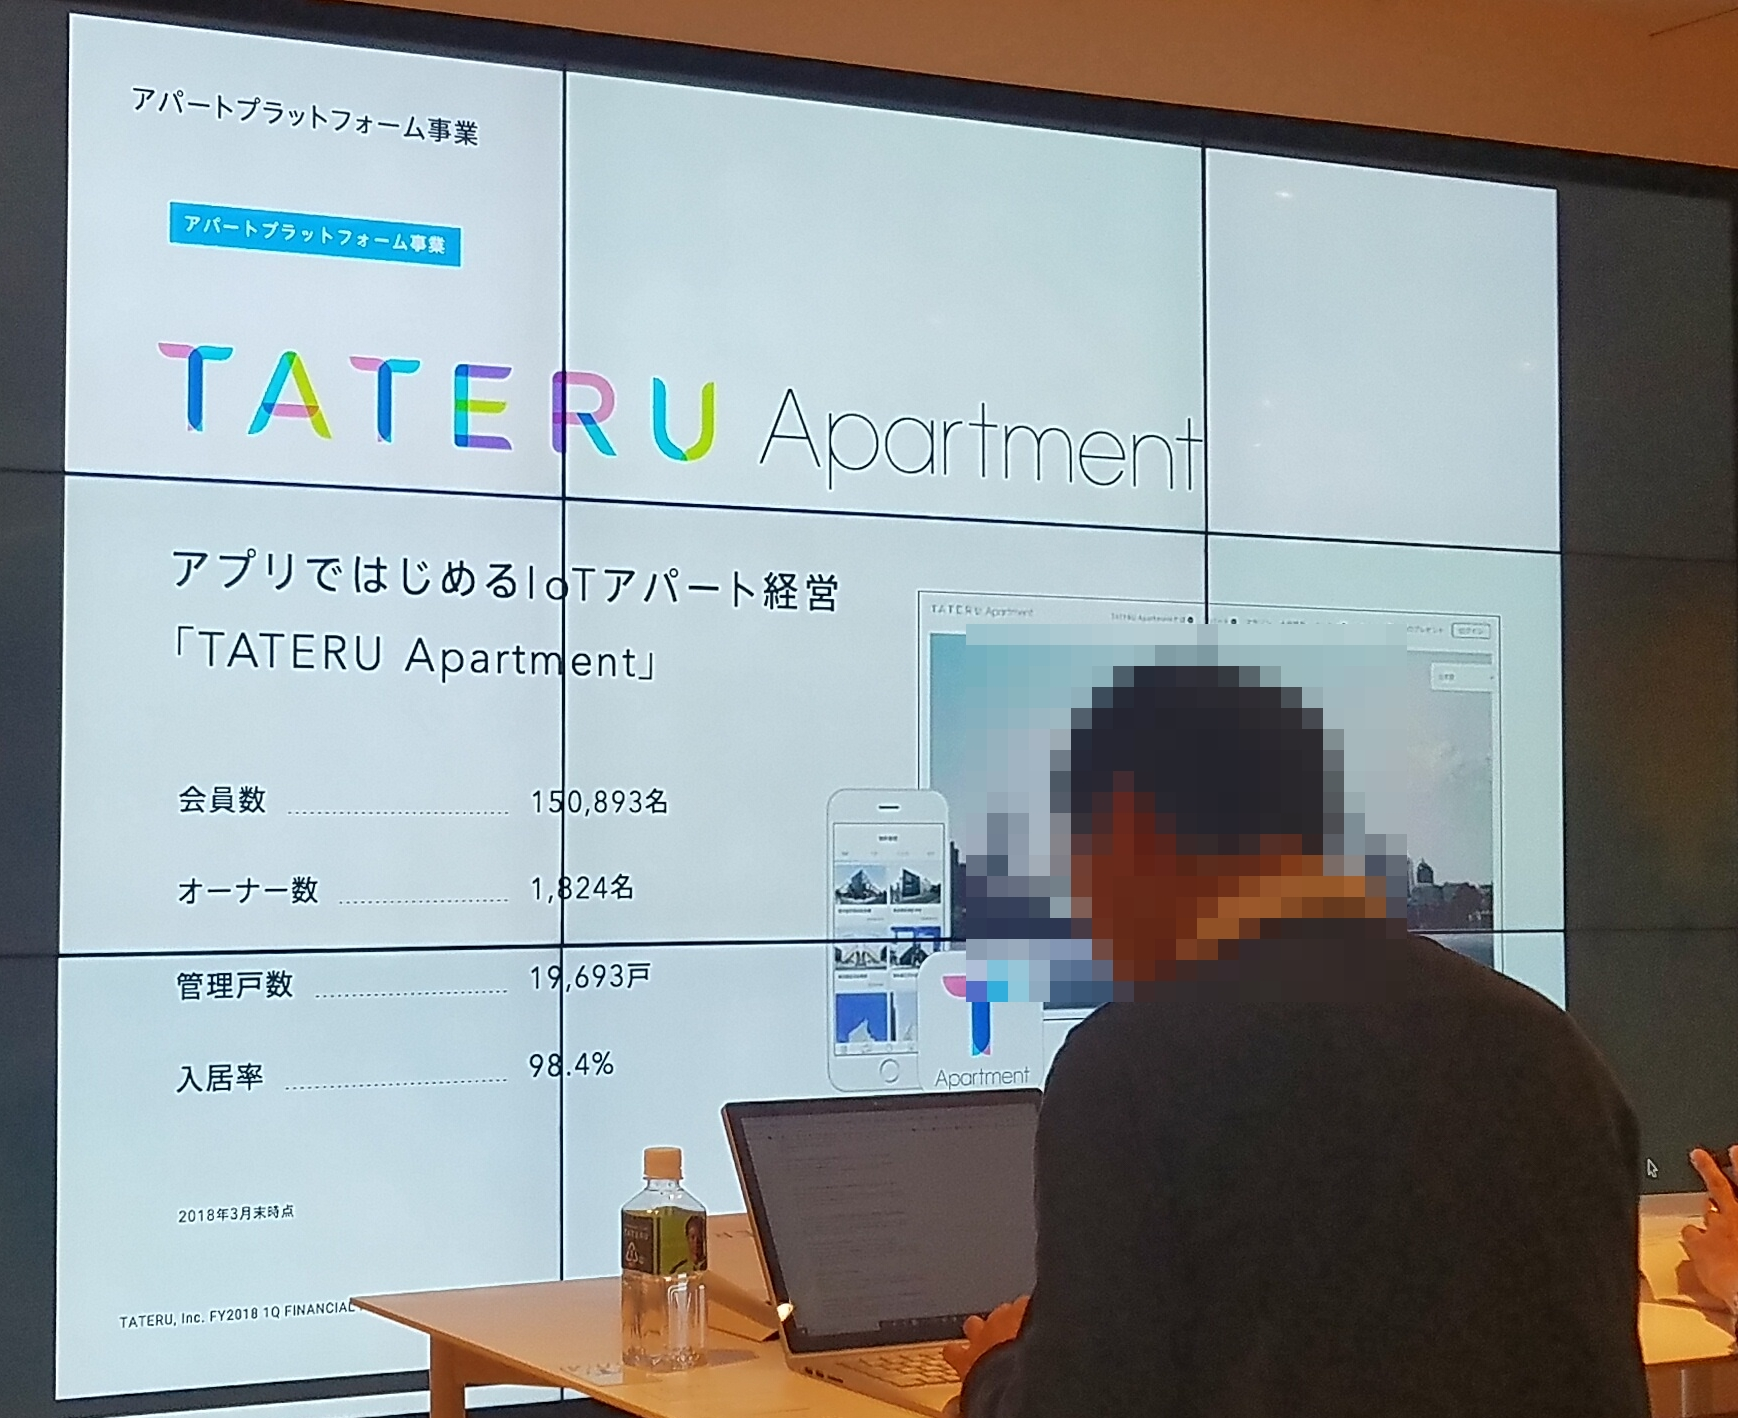 01_TATERU_Apartment